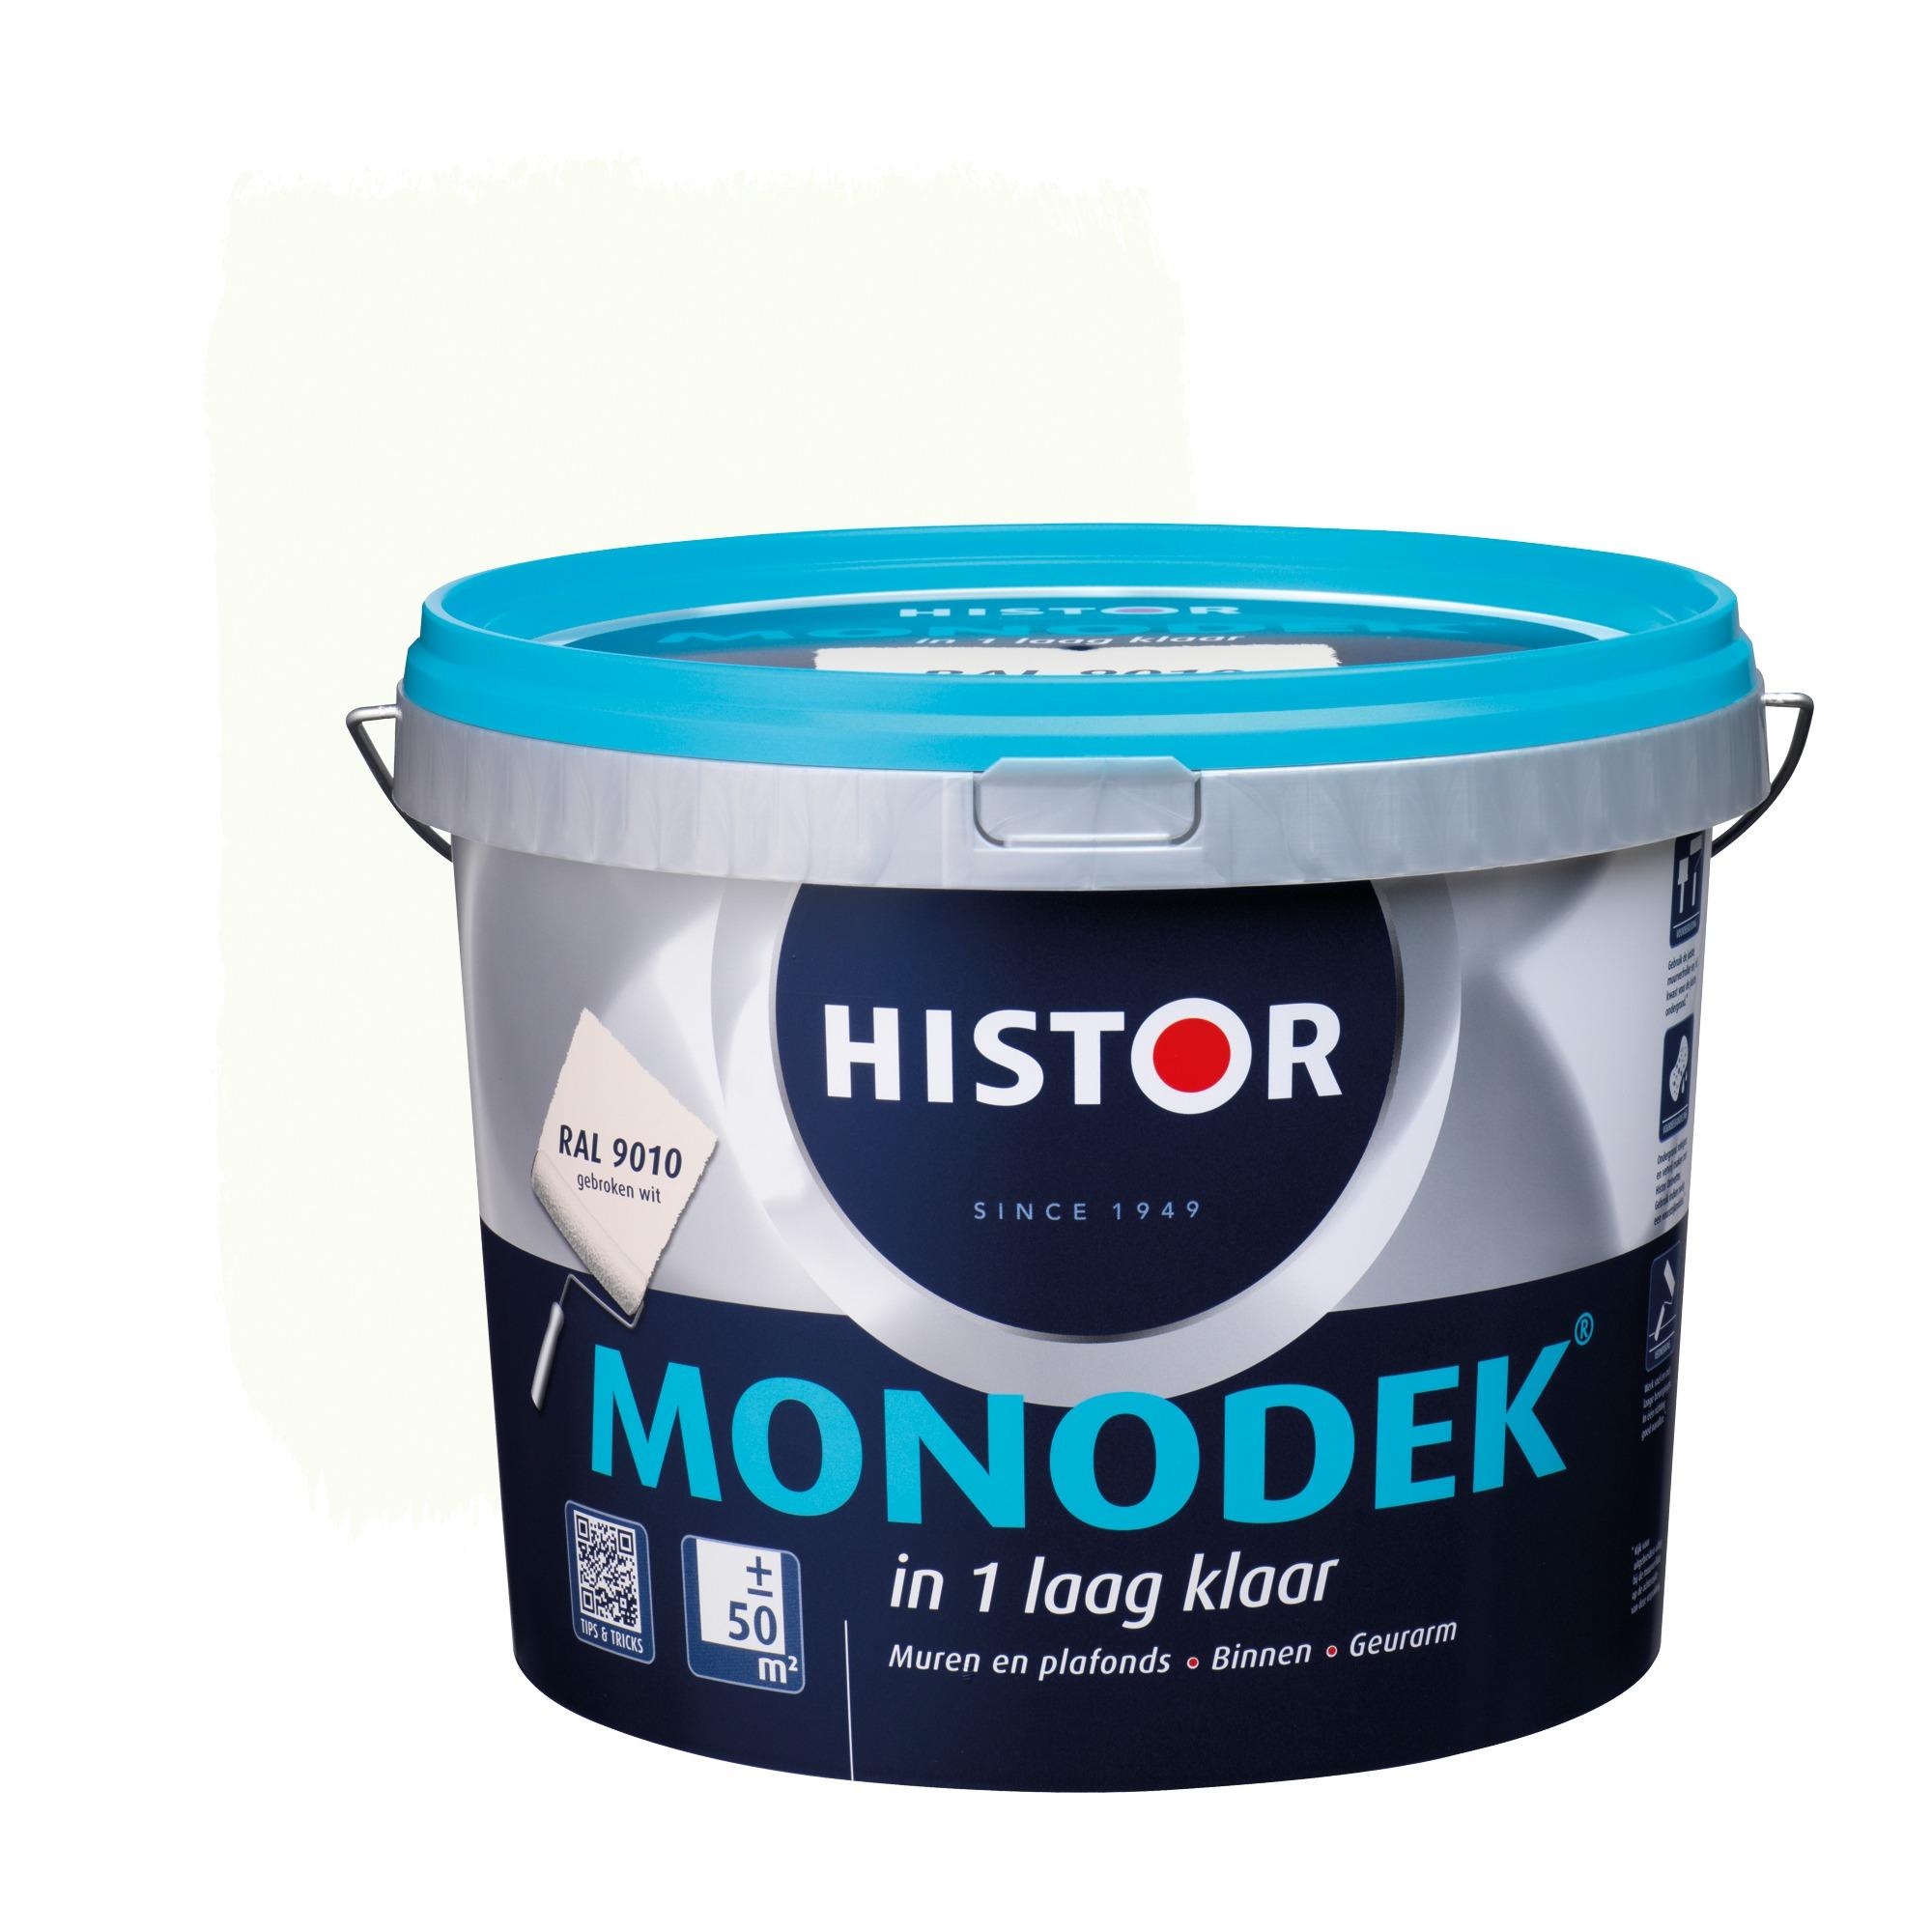 Histor Monodek muurverf mat gebroken wit 9010 5 l